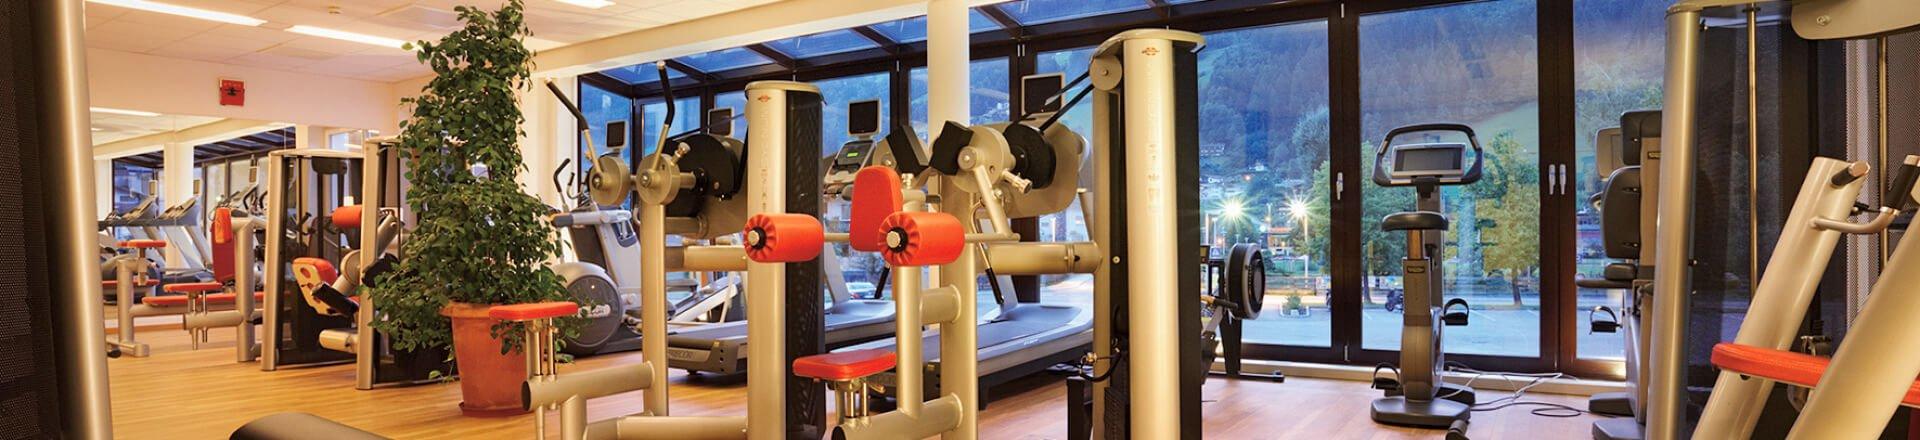 Fitnessraum im Sporthotel Theresa im Zillertal